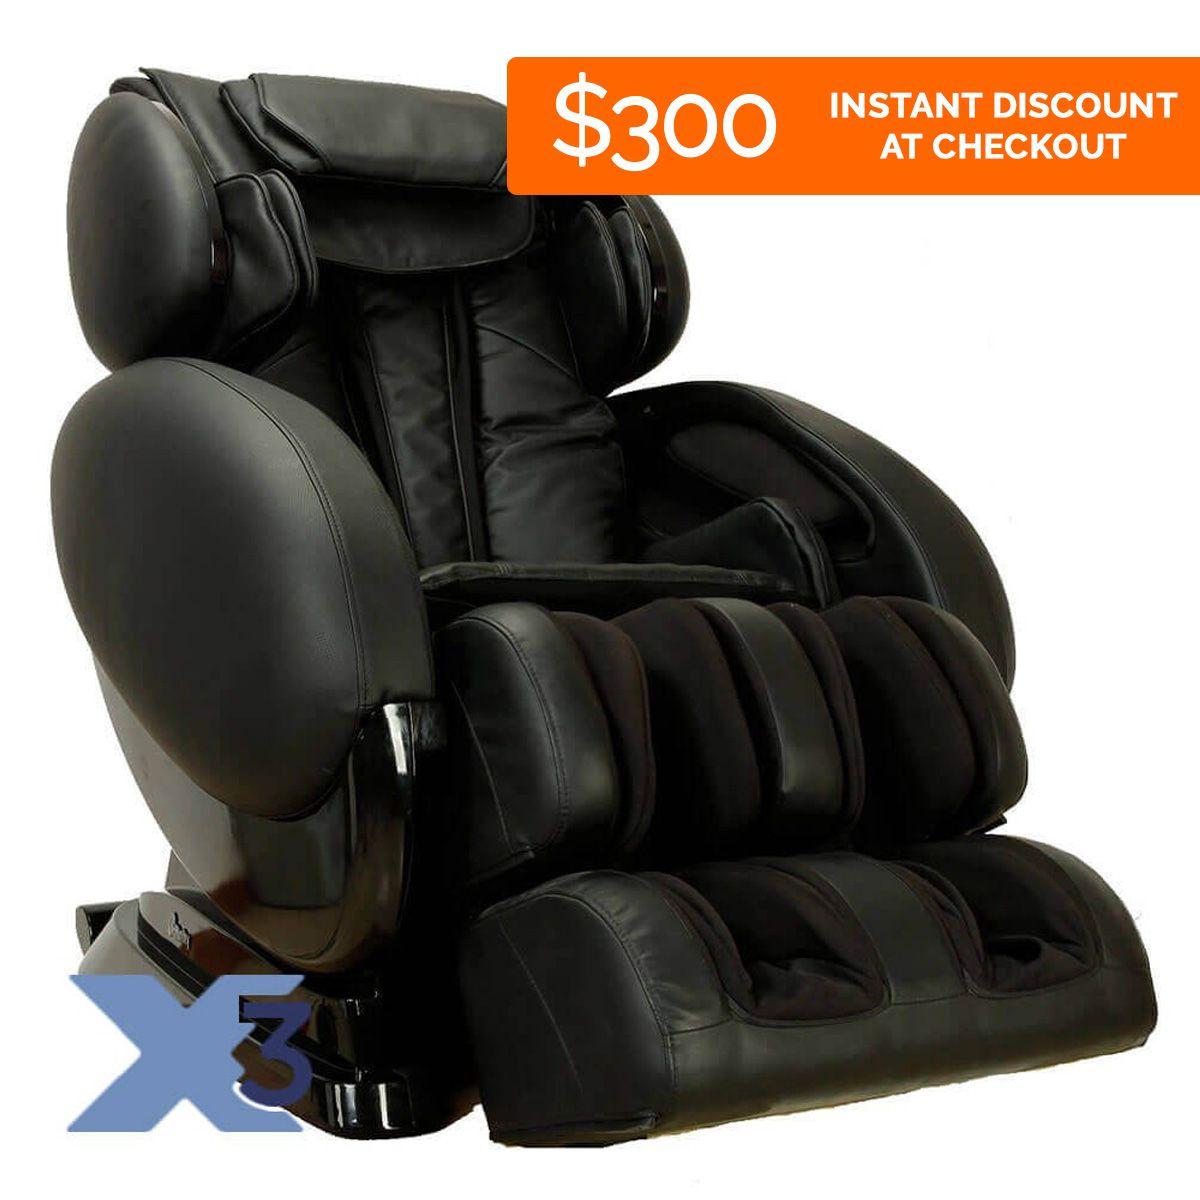 Infinity IT8500X3 Massage Chair Massage chair, Massage